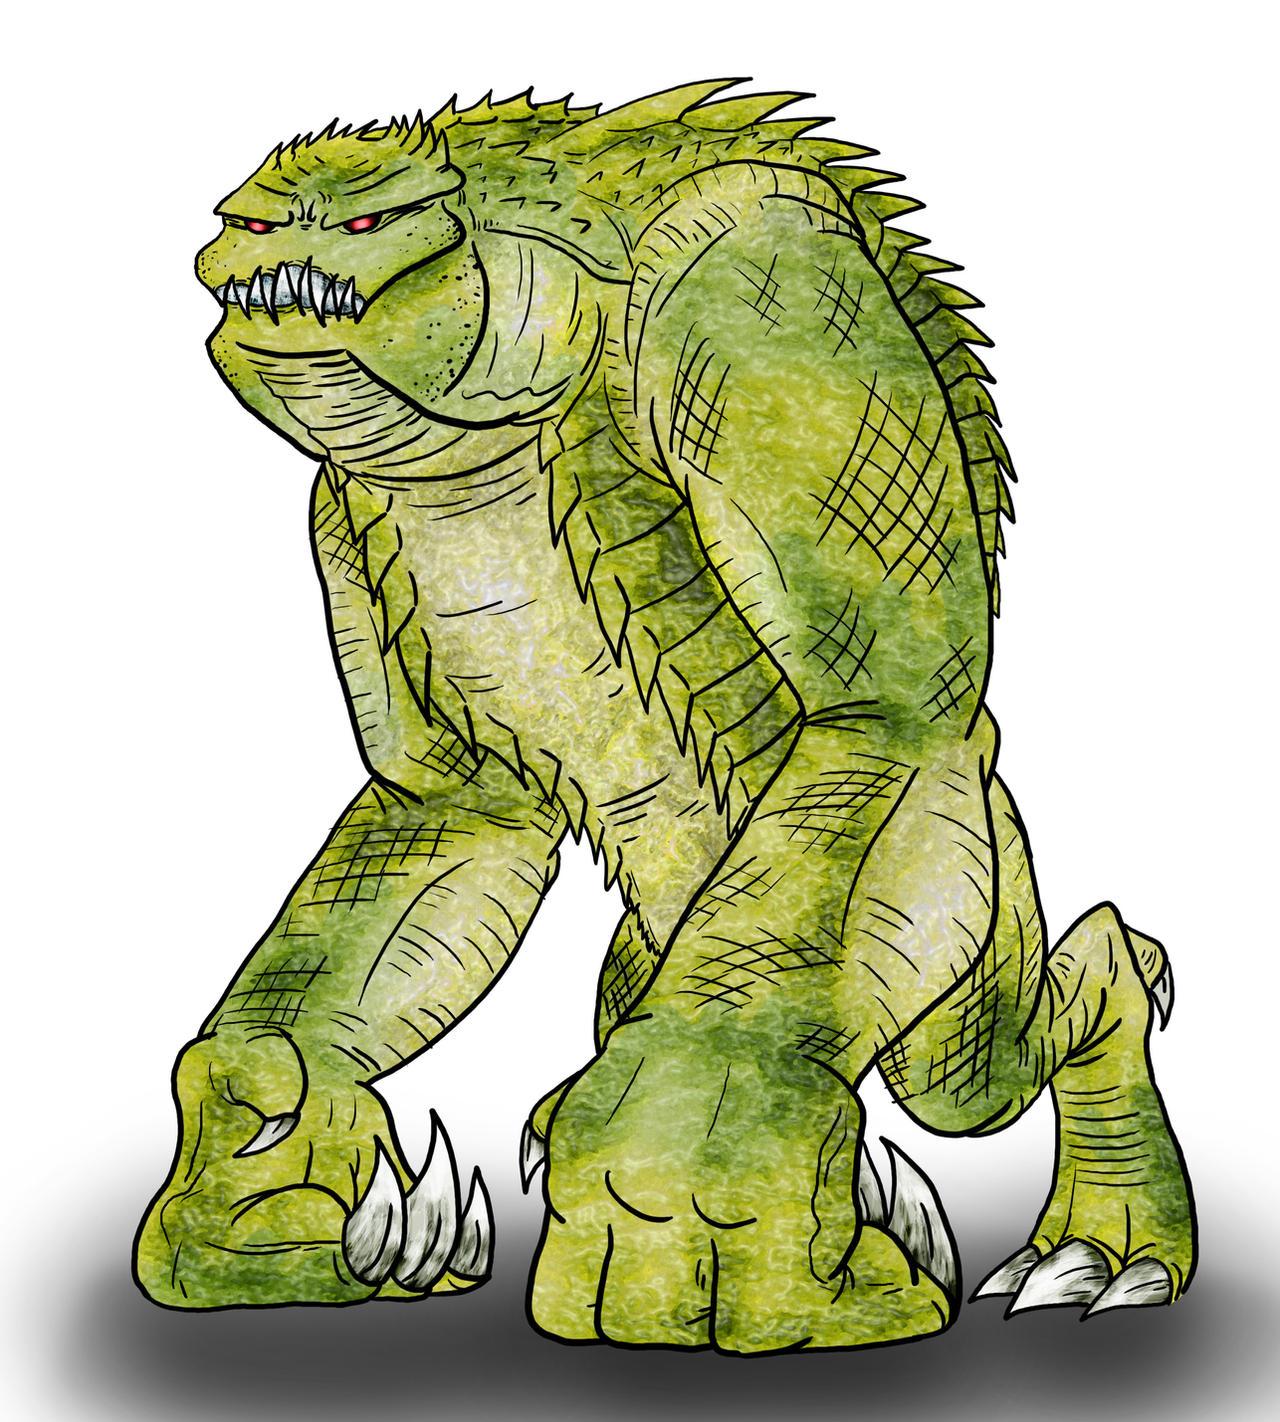 Visser: Alligorilla by Monster-Man-08